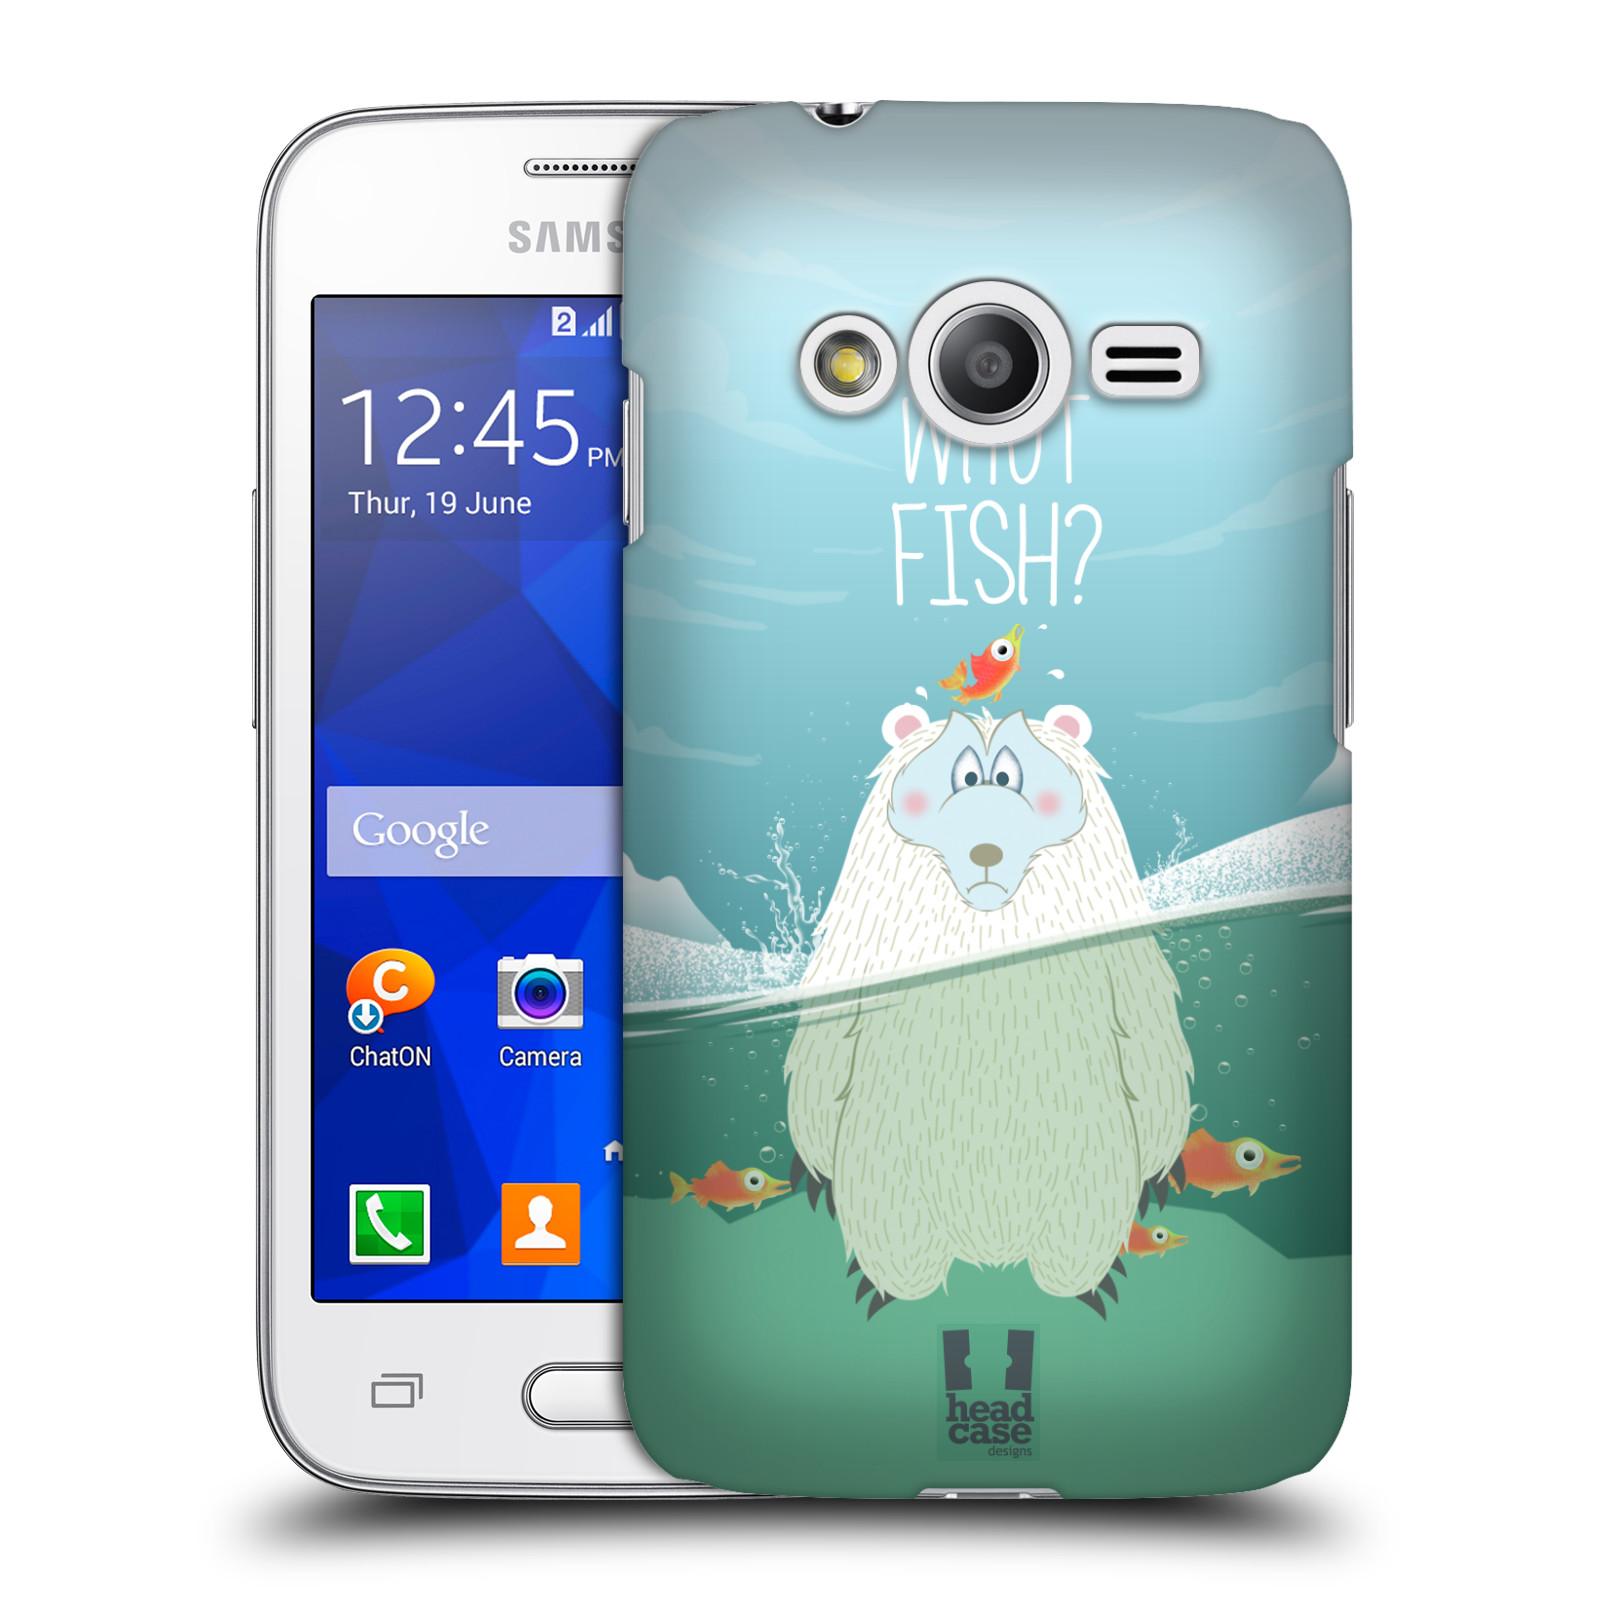 Plastové pouzdro na mobil Samsung Galaxy Trend 2 Lite HEAD CASE Medvěd Whut Fish? (Kryt či obal na mobilní telefon Samsung Galaxy Trend 2 Lite SM-G318)